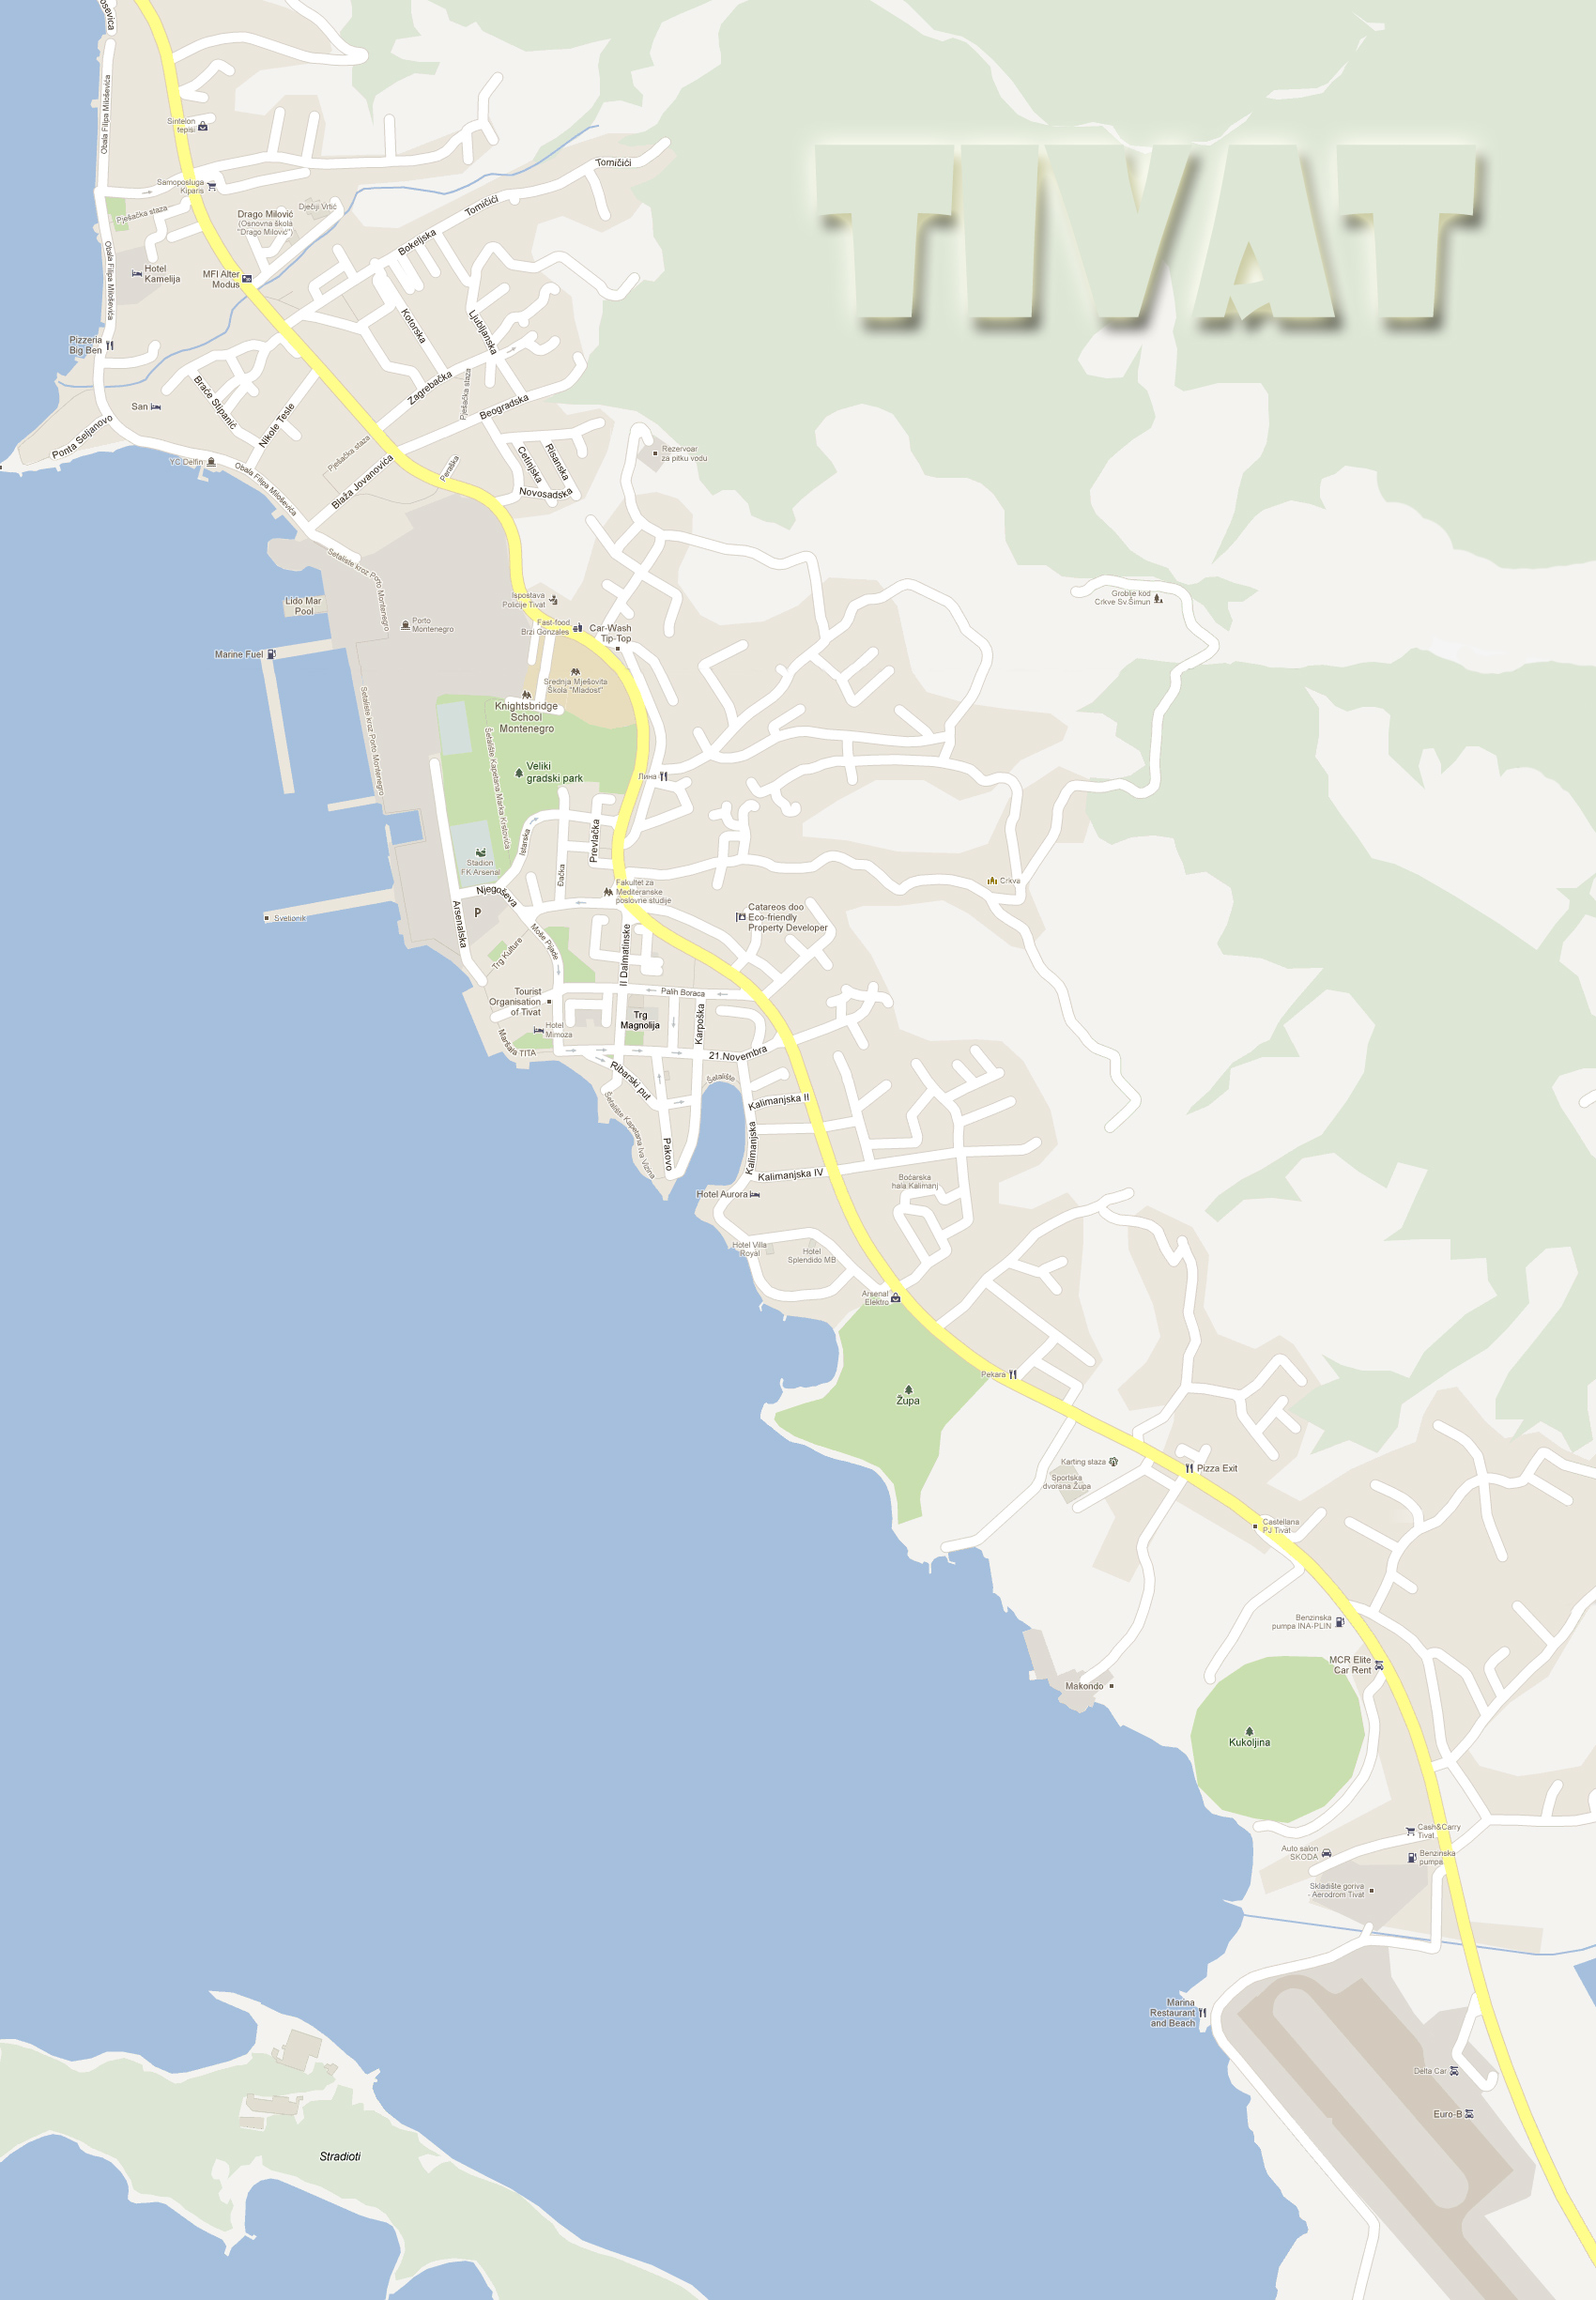 tivat mapa Mapa   Tivat, Crna Gora tivat mapa